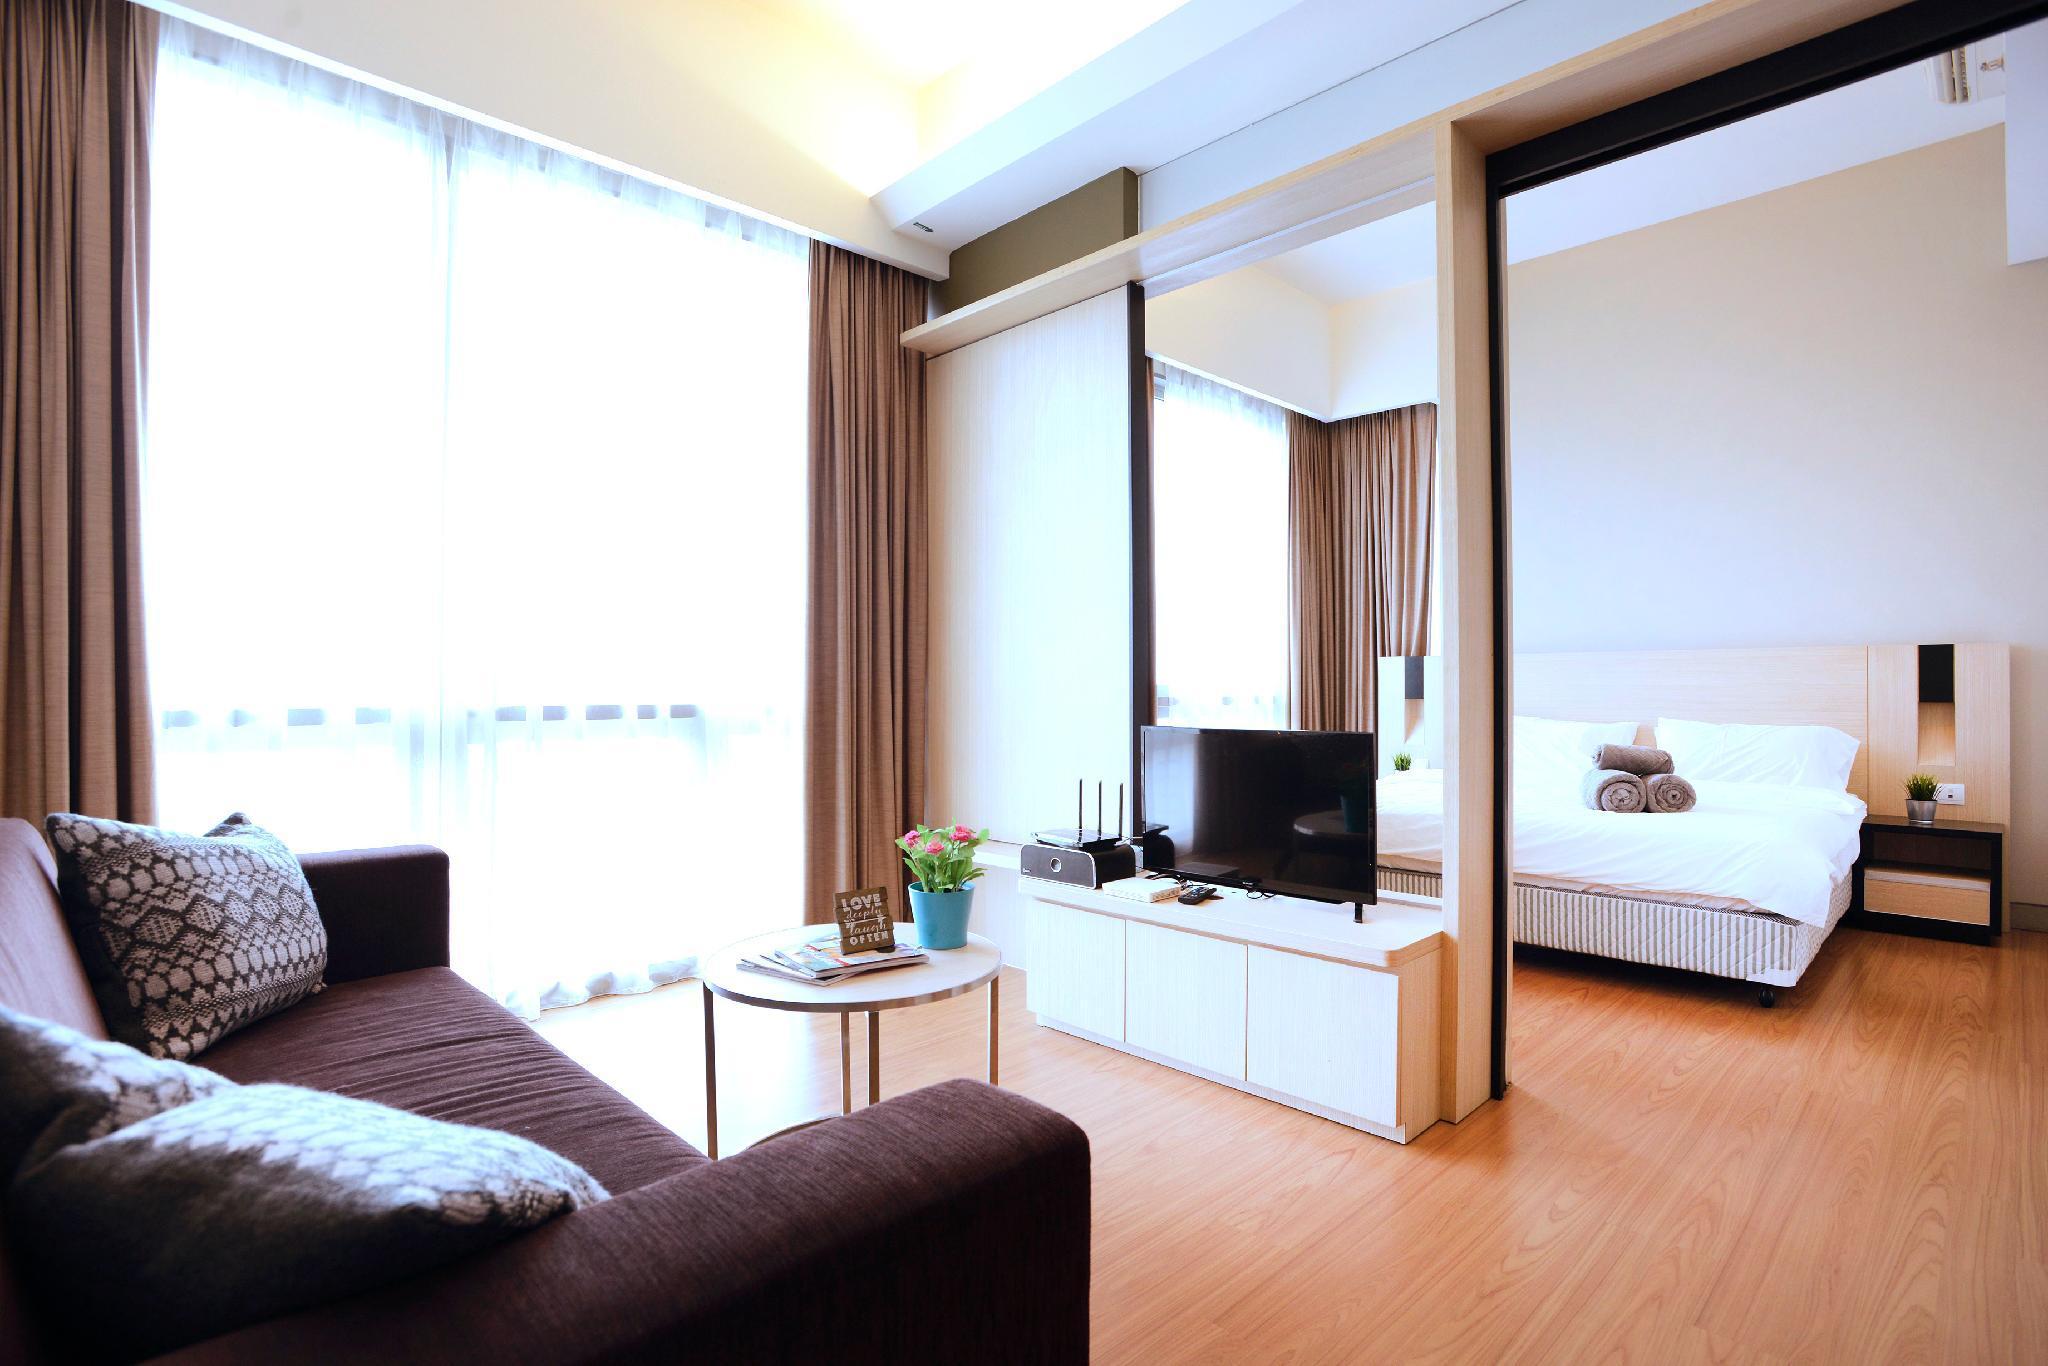 04 Swiss Garden Residence 1R1B KL @WT Stay